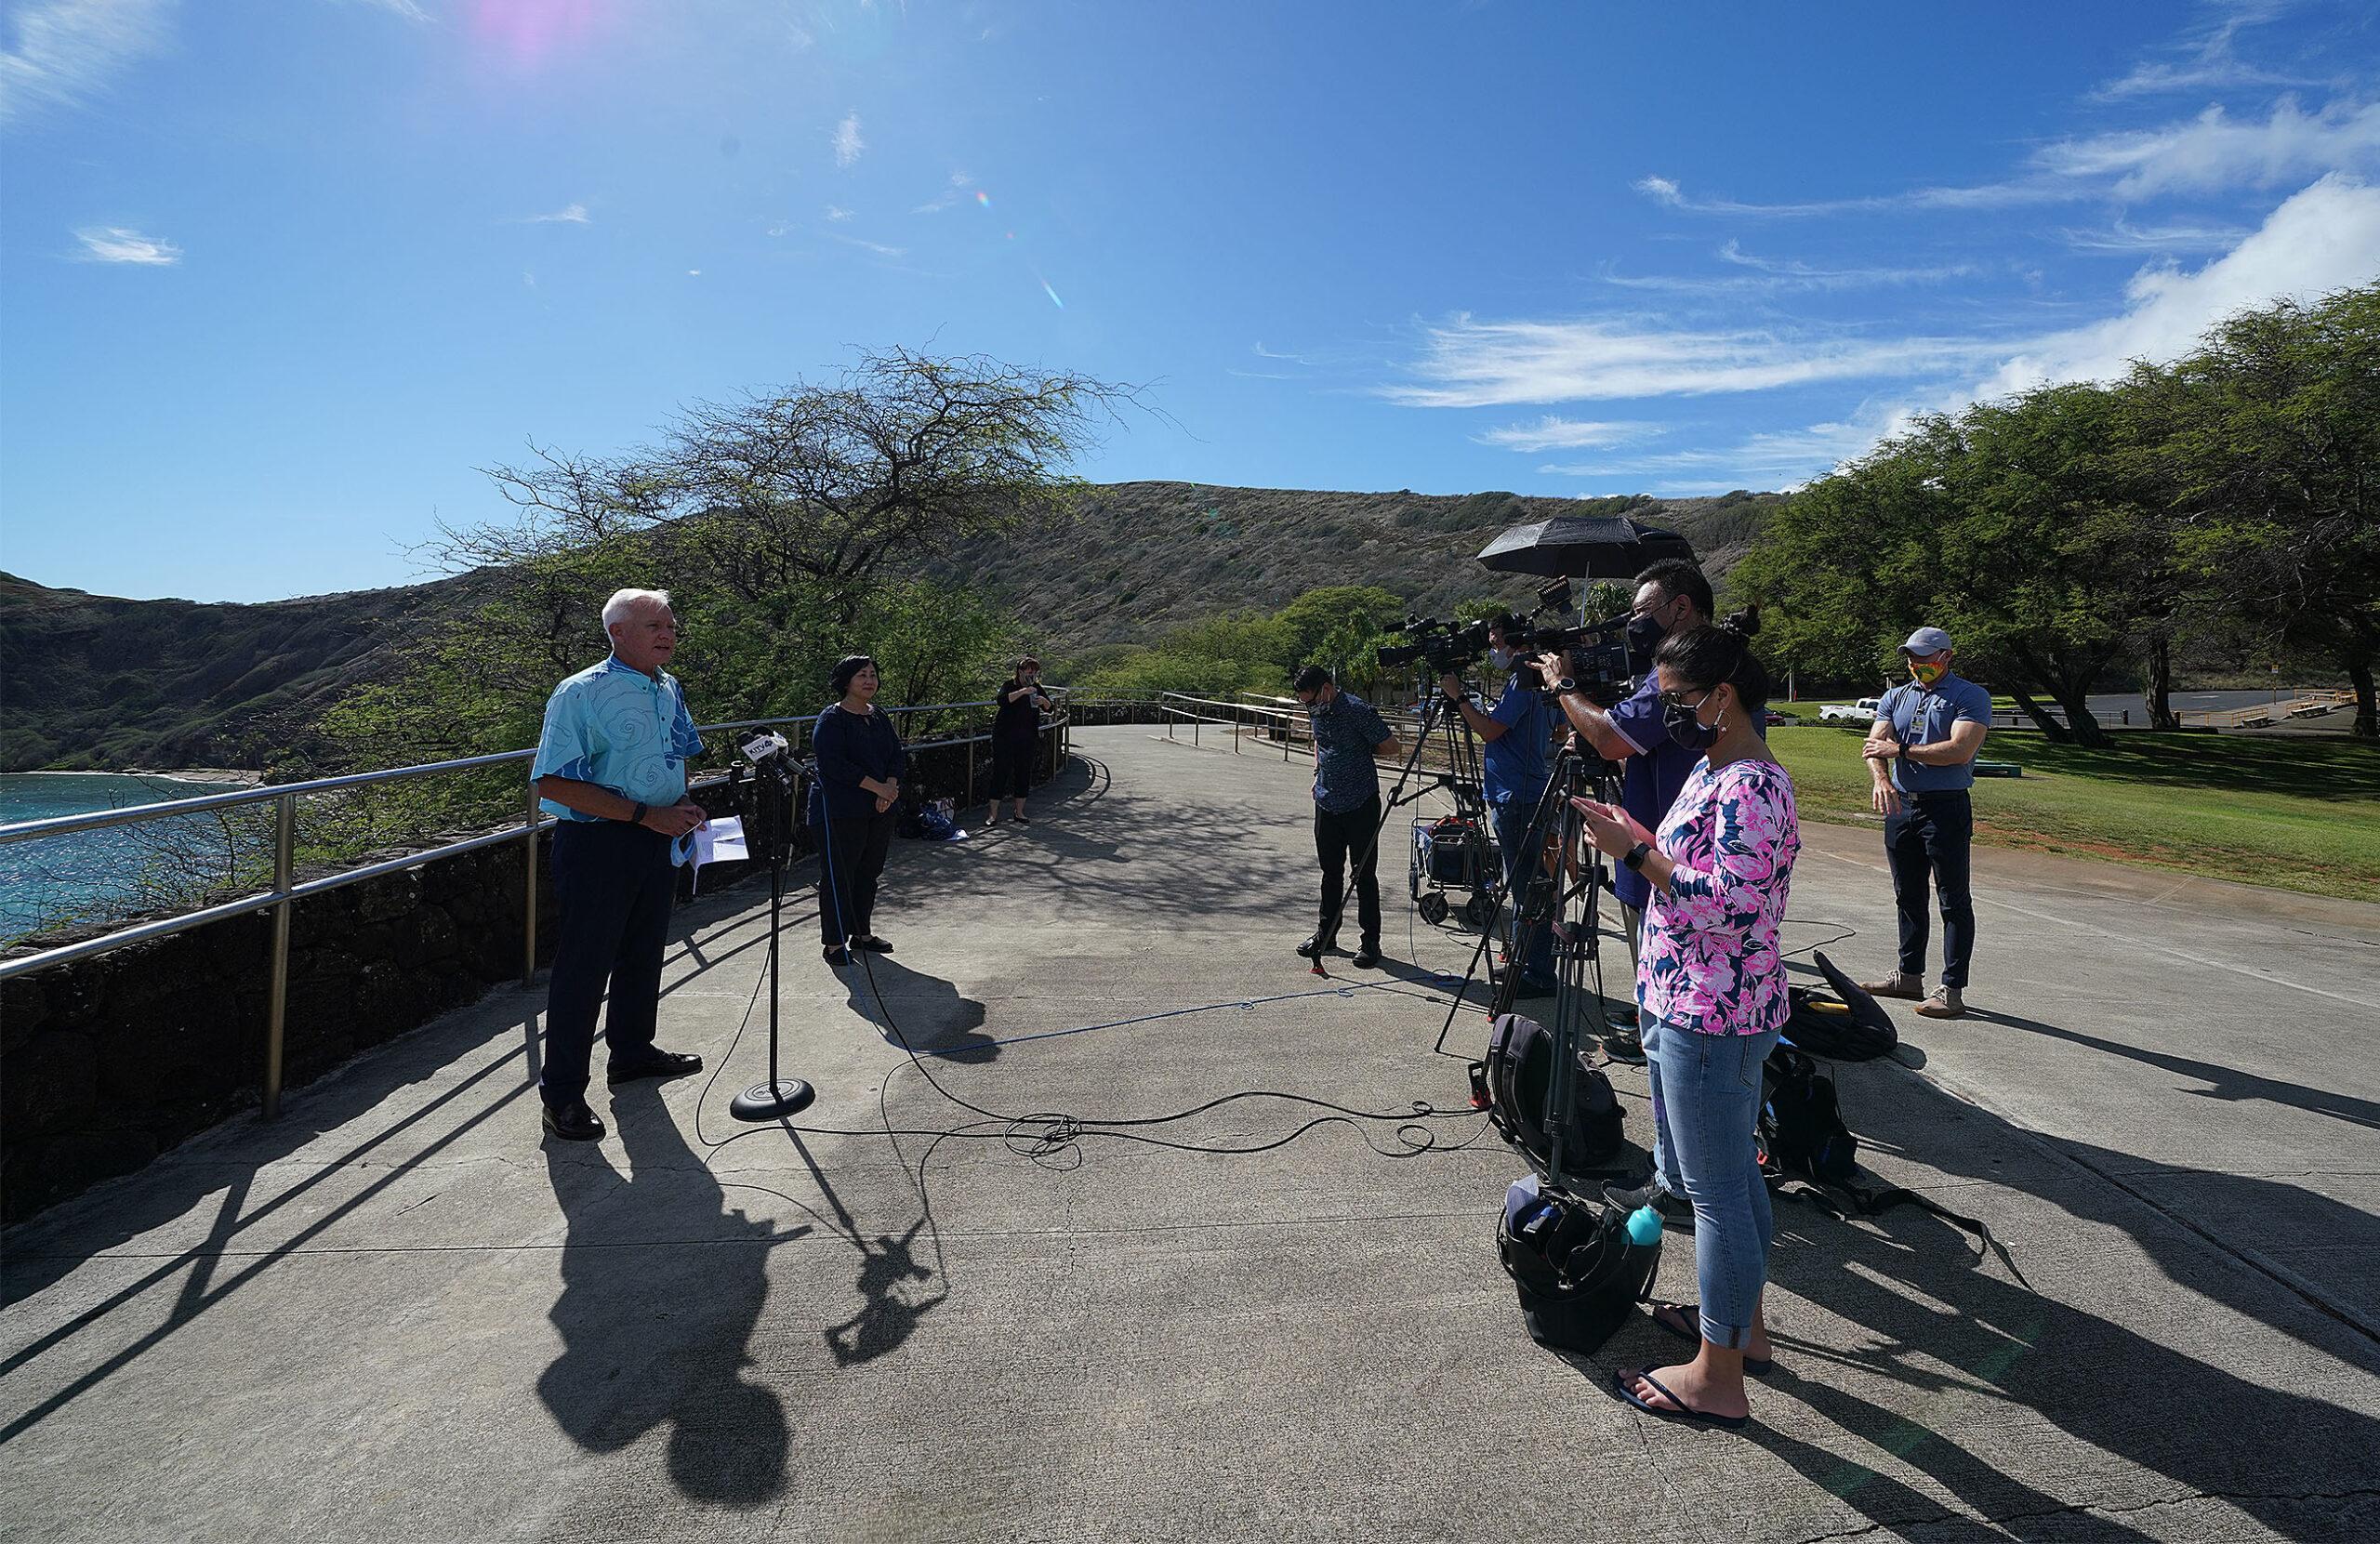 Mayor Kirk Caldwell speaks at press conference on reopening Hanauma Nature Preserve.